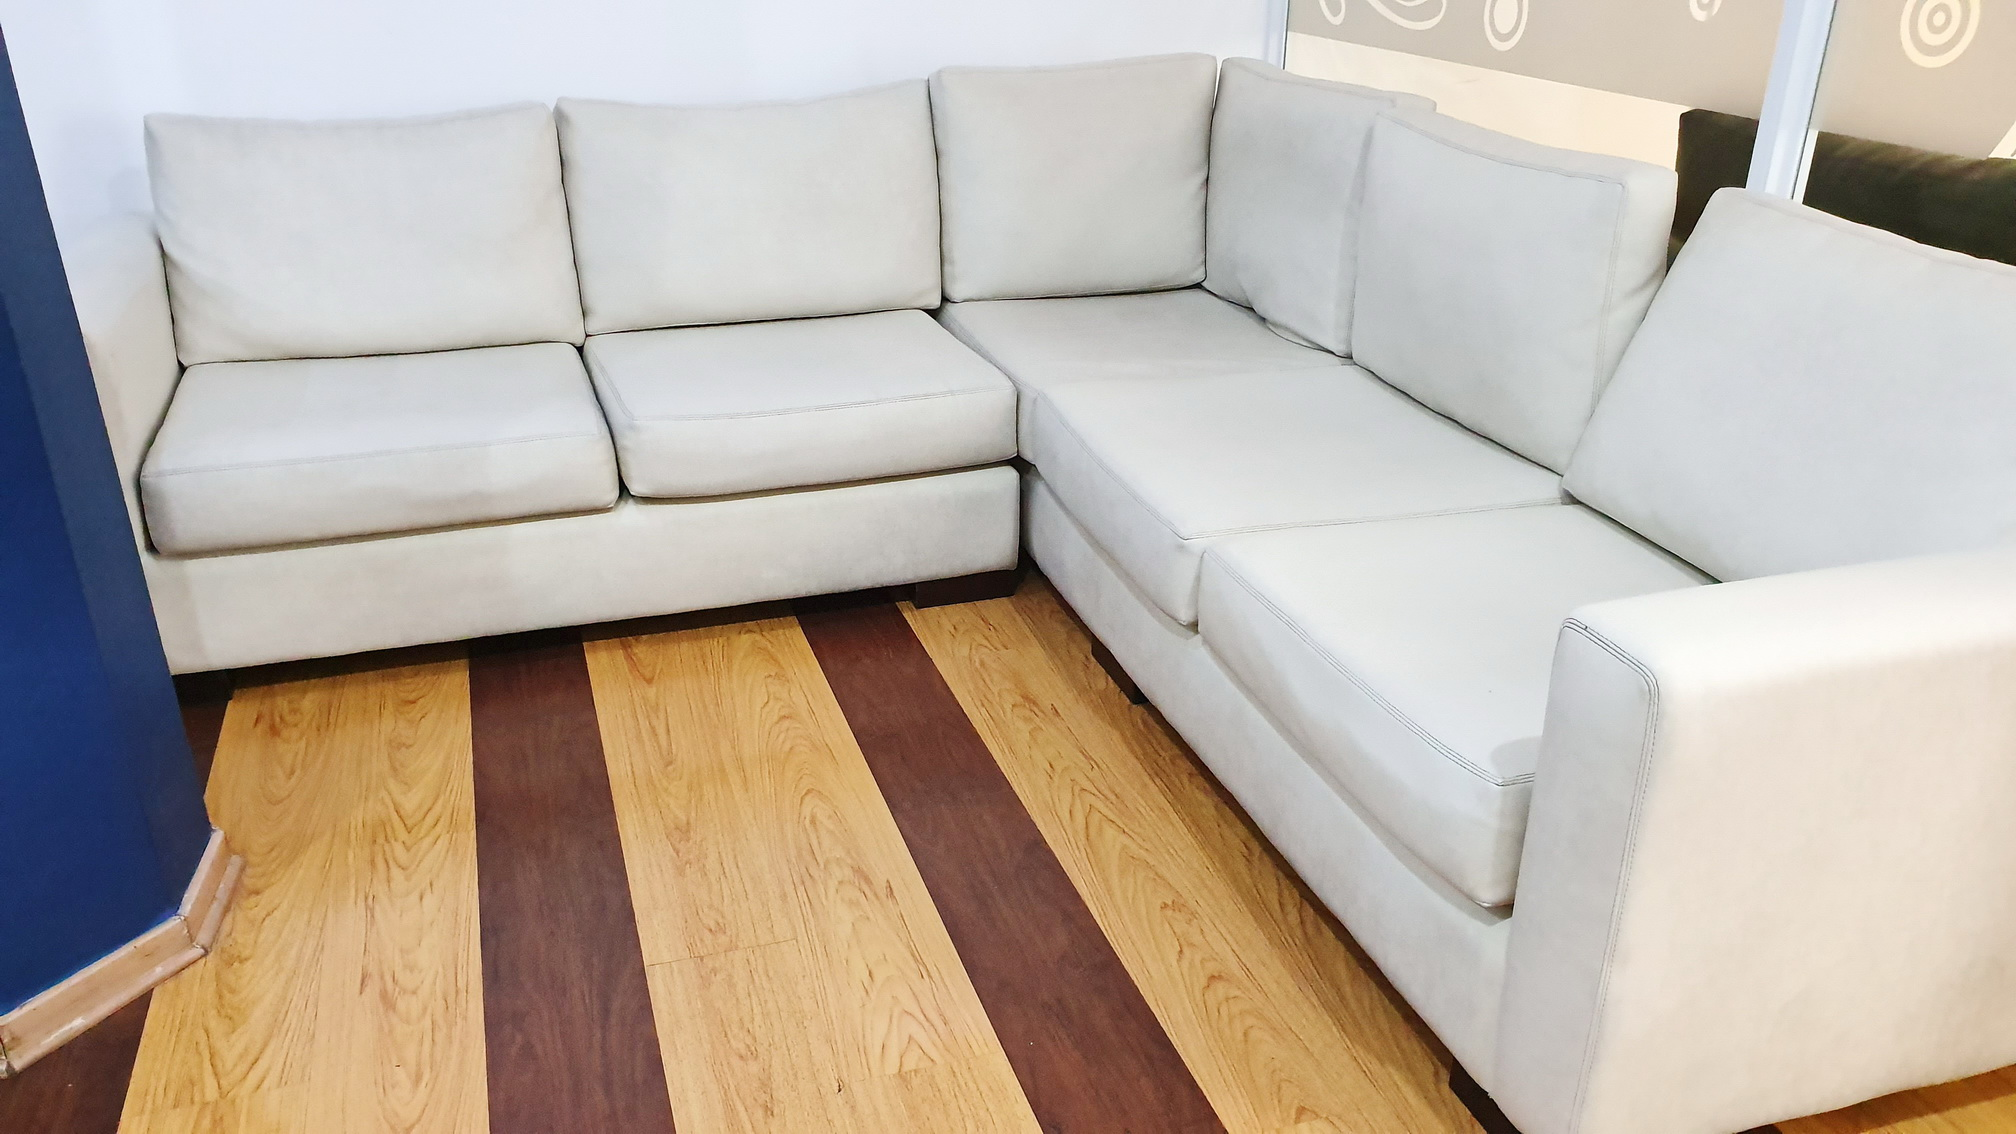 Sofa rinconero